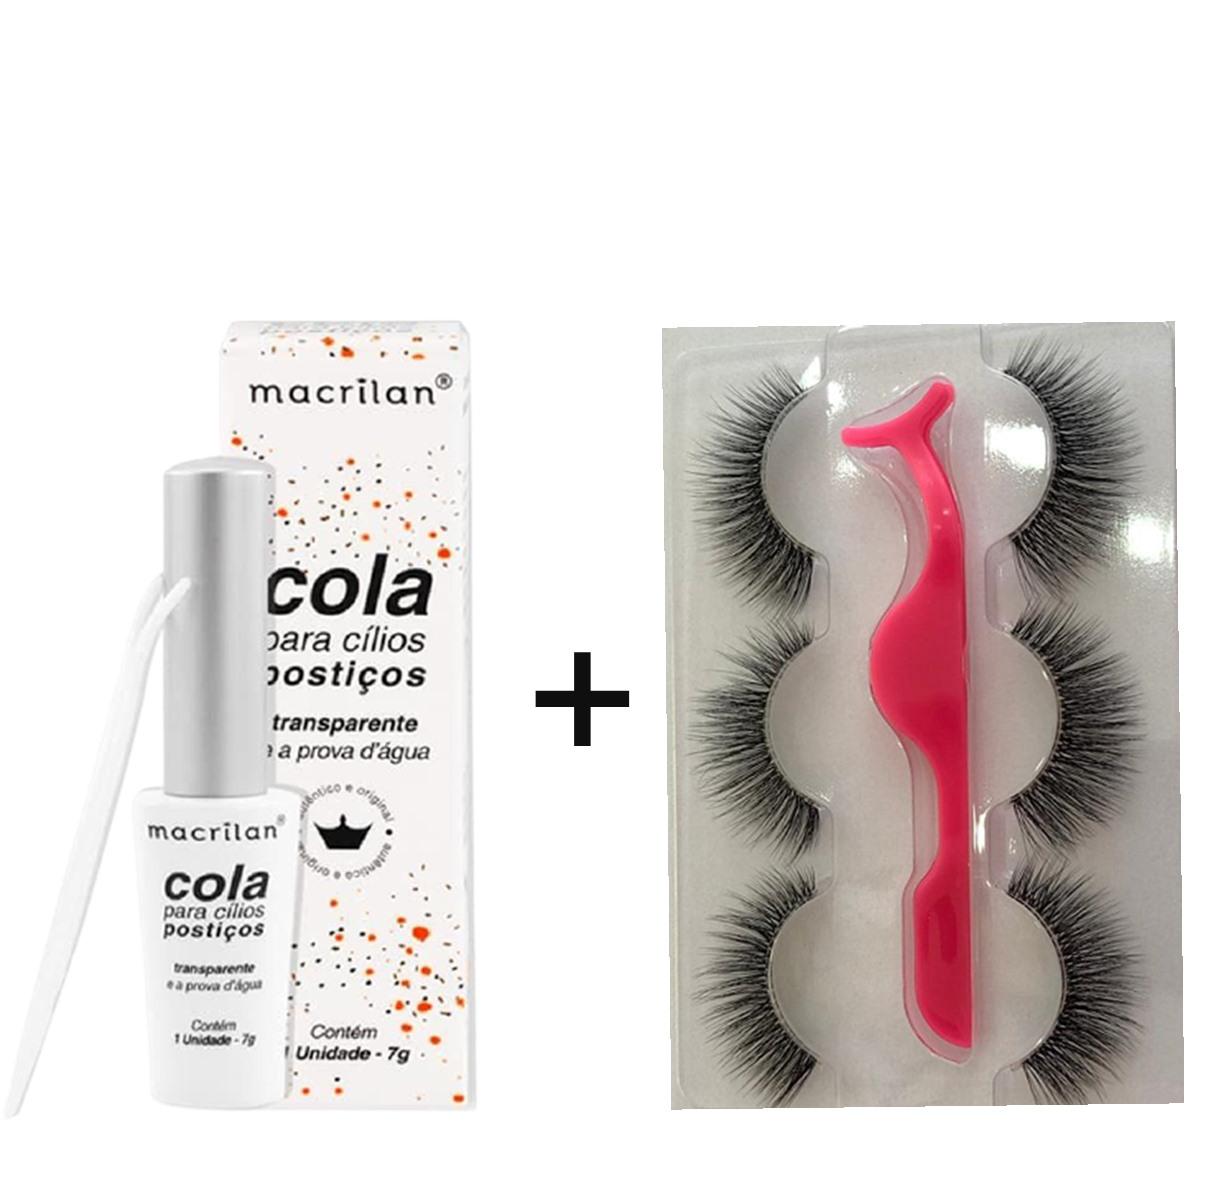 Cílios Postiços Kit C/ 3 Pares + Cola Macrilan